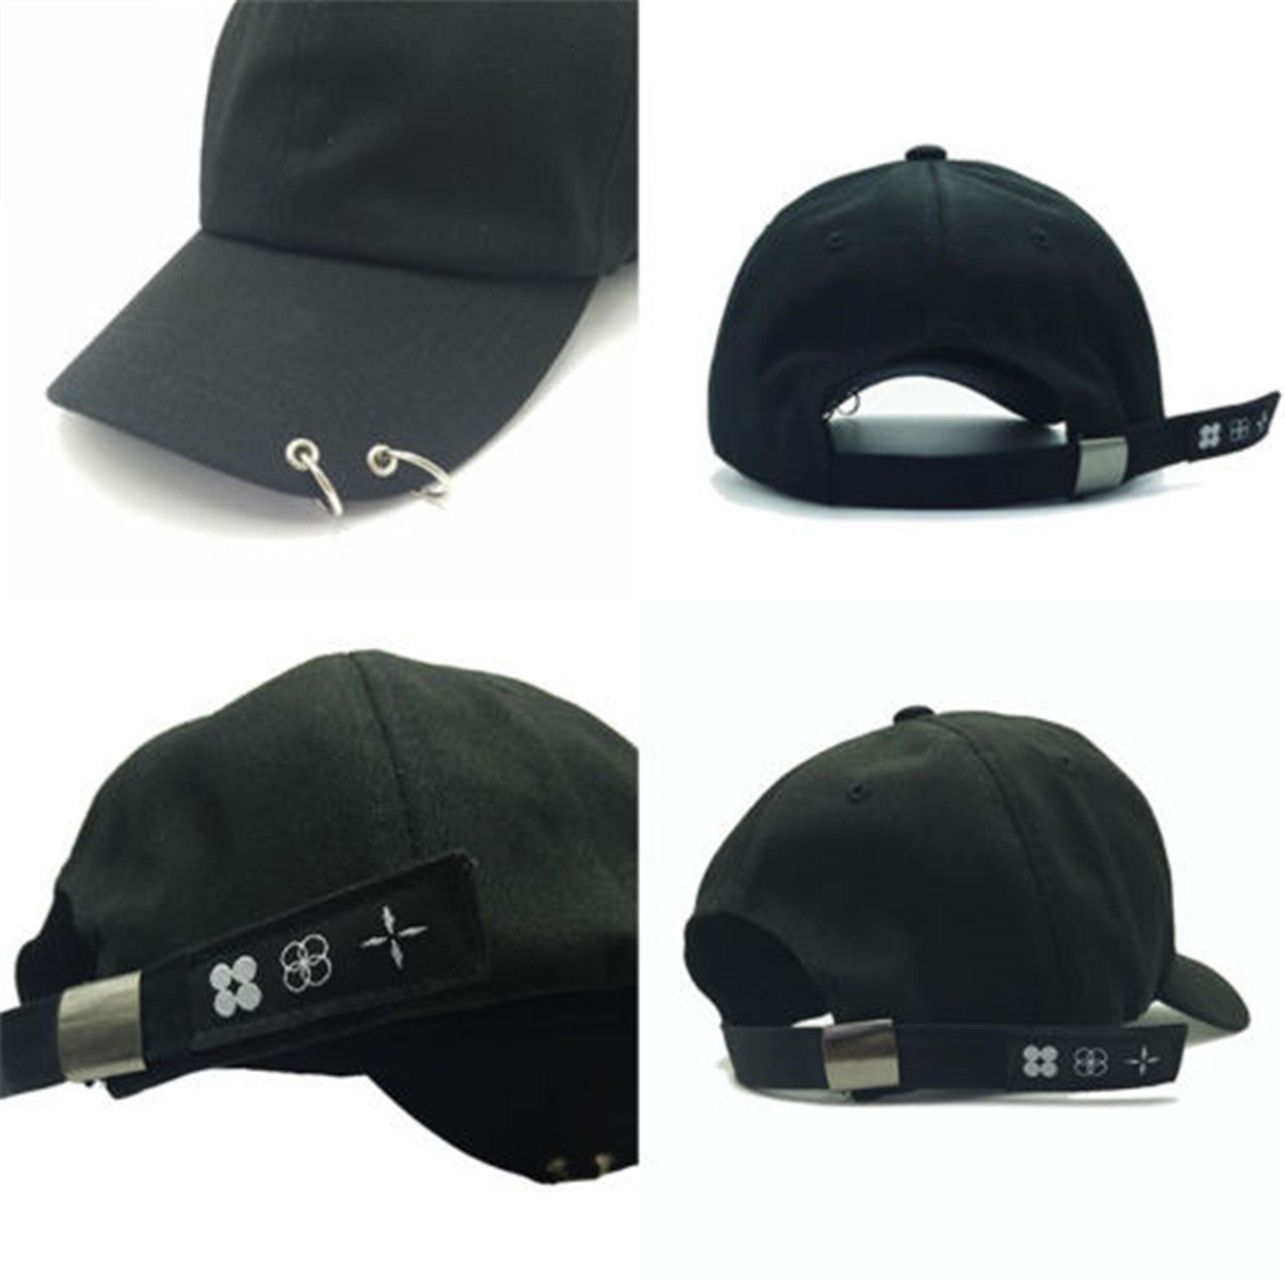 c363b64e274 Kpop Bts Live The Wings Tour Hat Bangtan Boys Ring Baseball Cap Adjustable  Ce